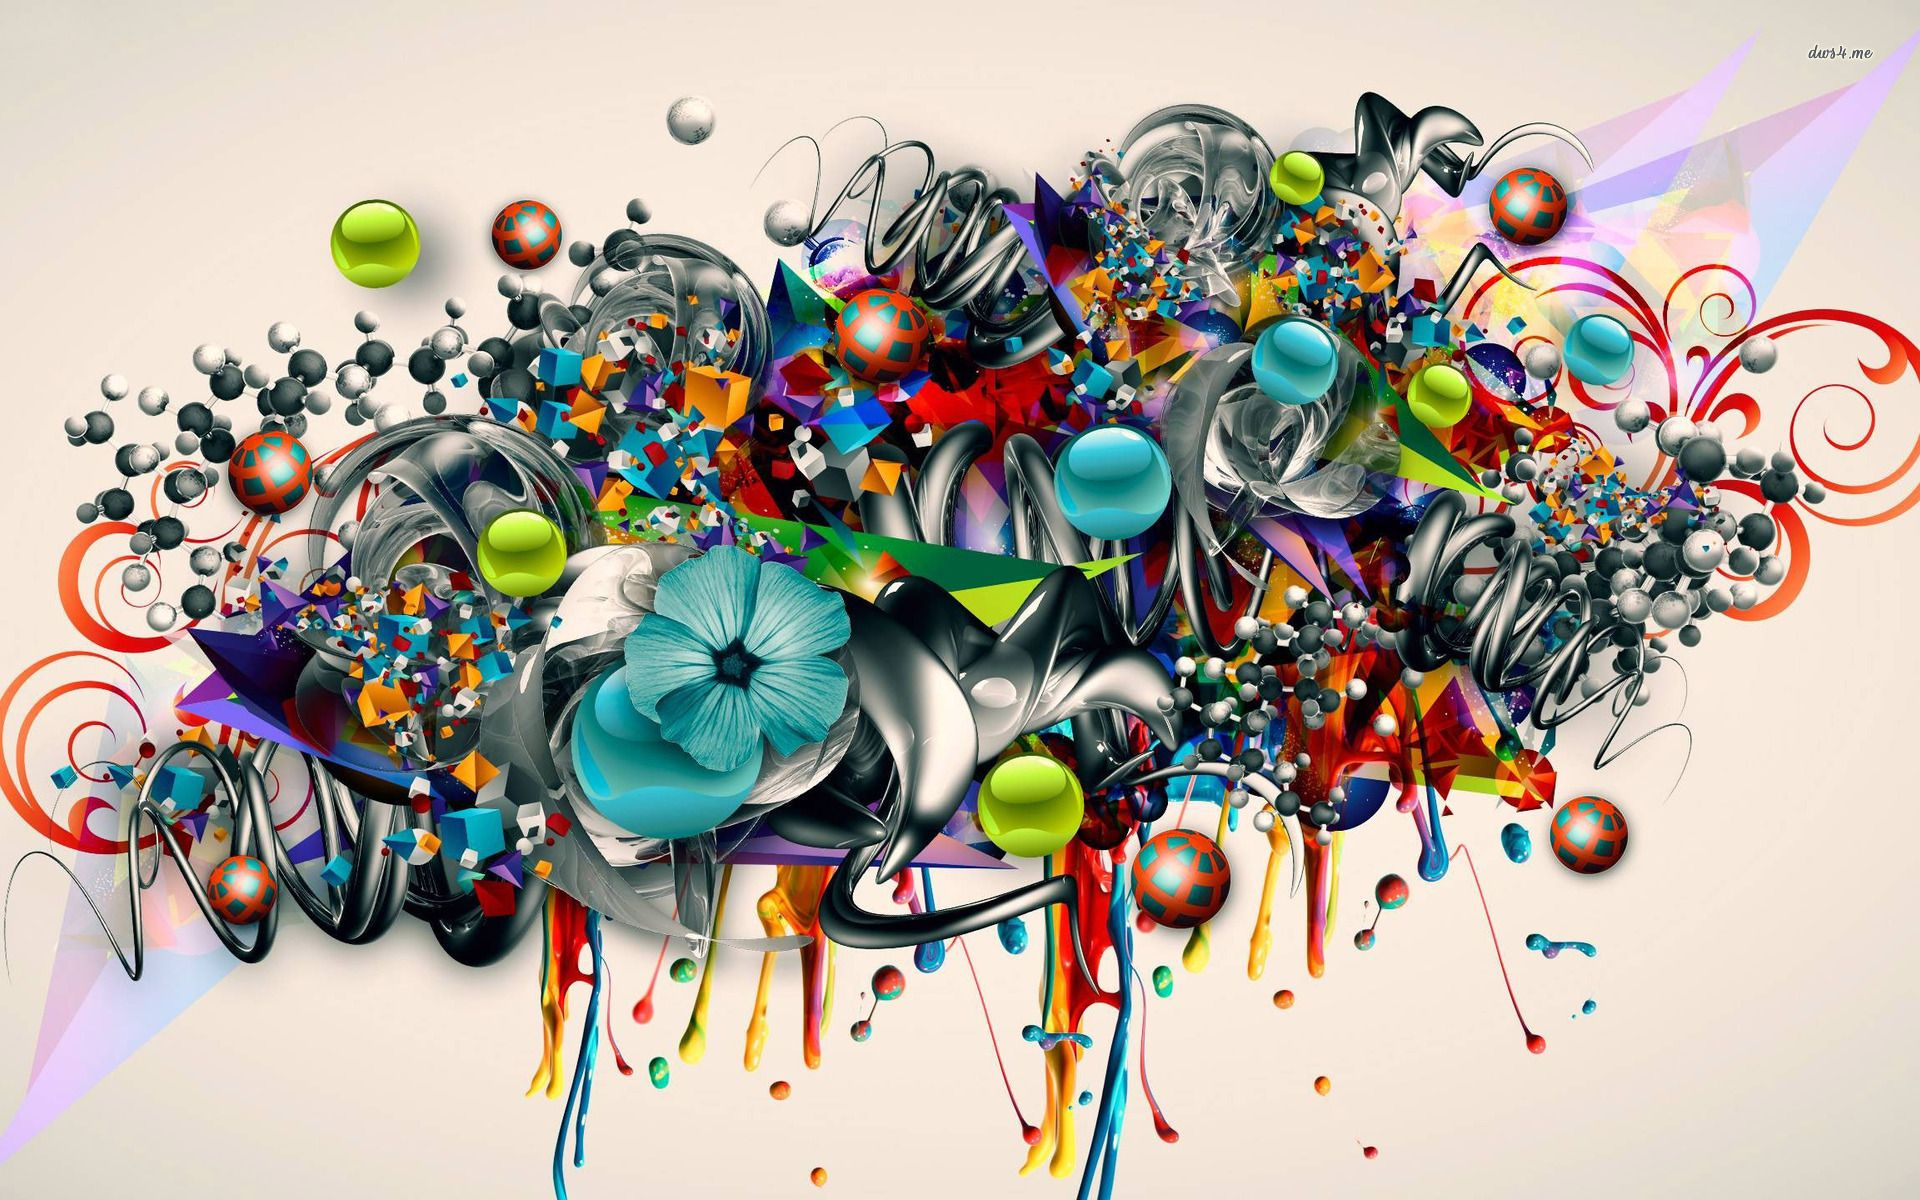 Graffiti Design Art Hd Wallpaper Pc Vignettes